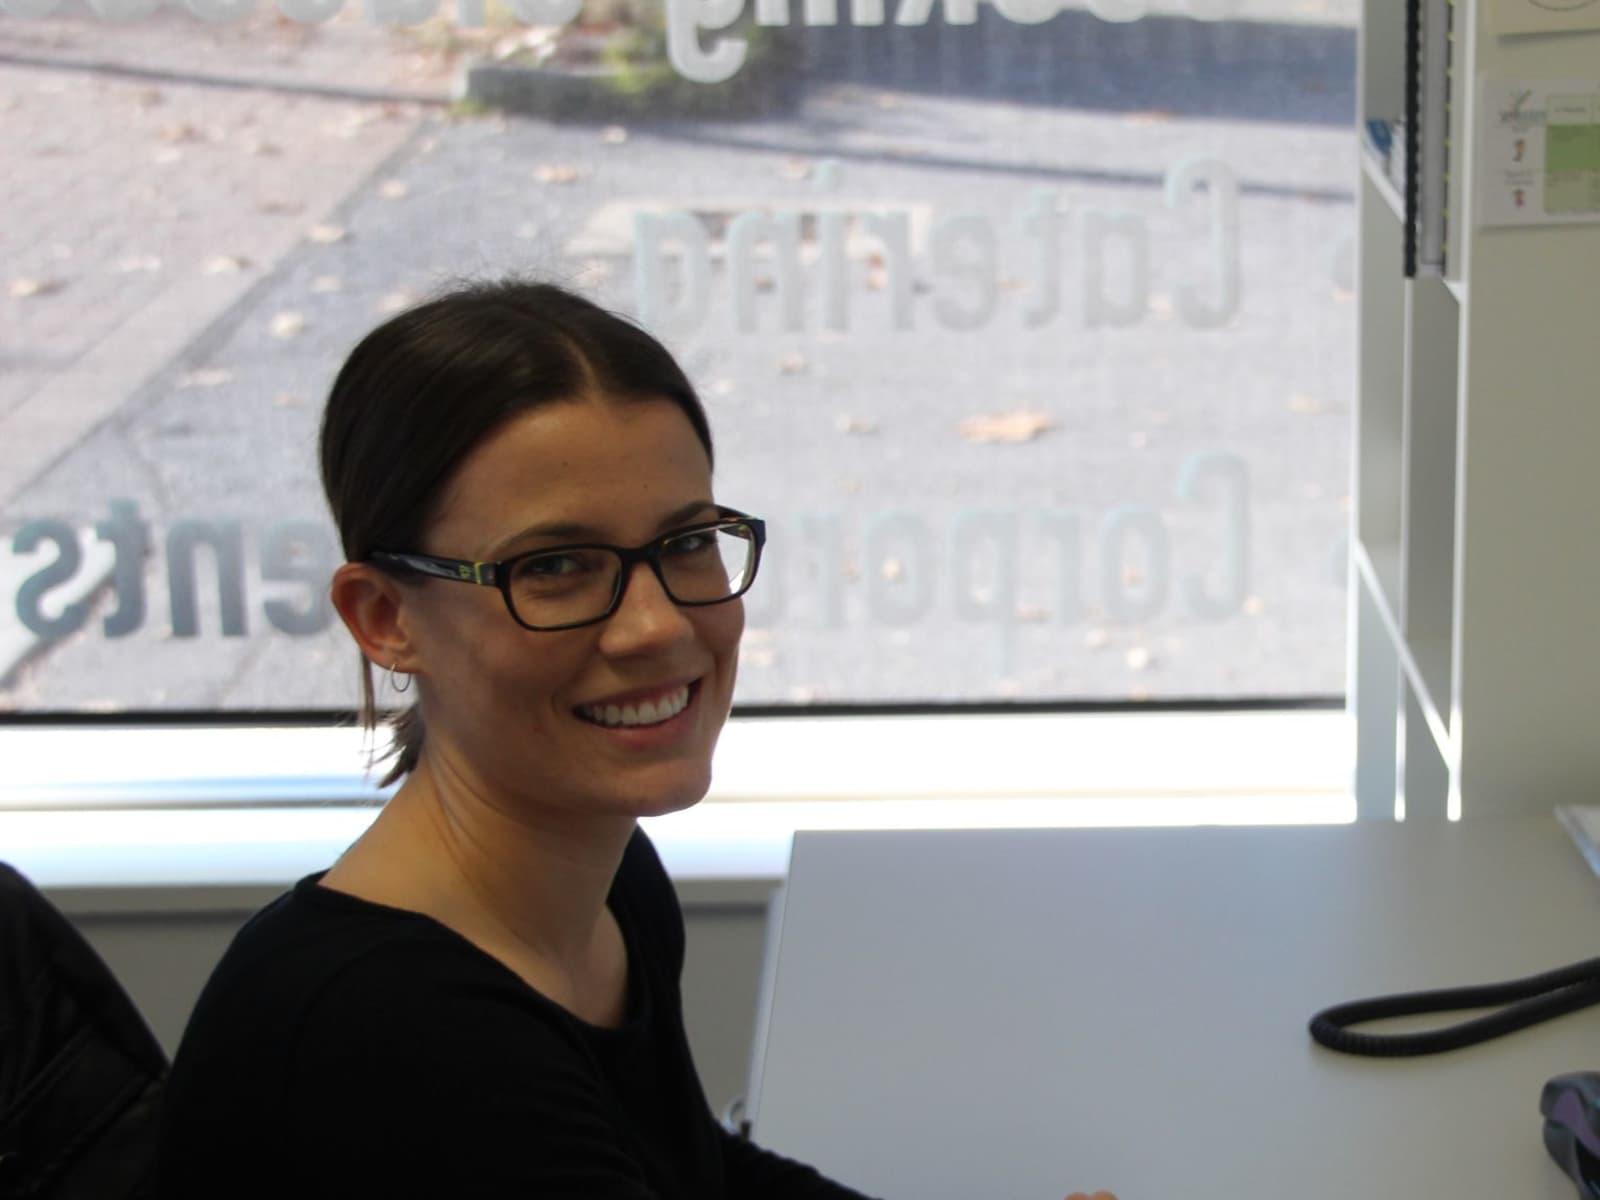 Jenna from Perth, Western Australia, Australia